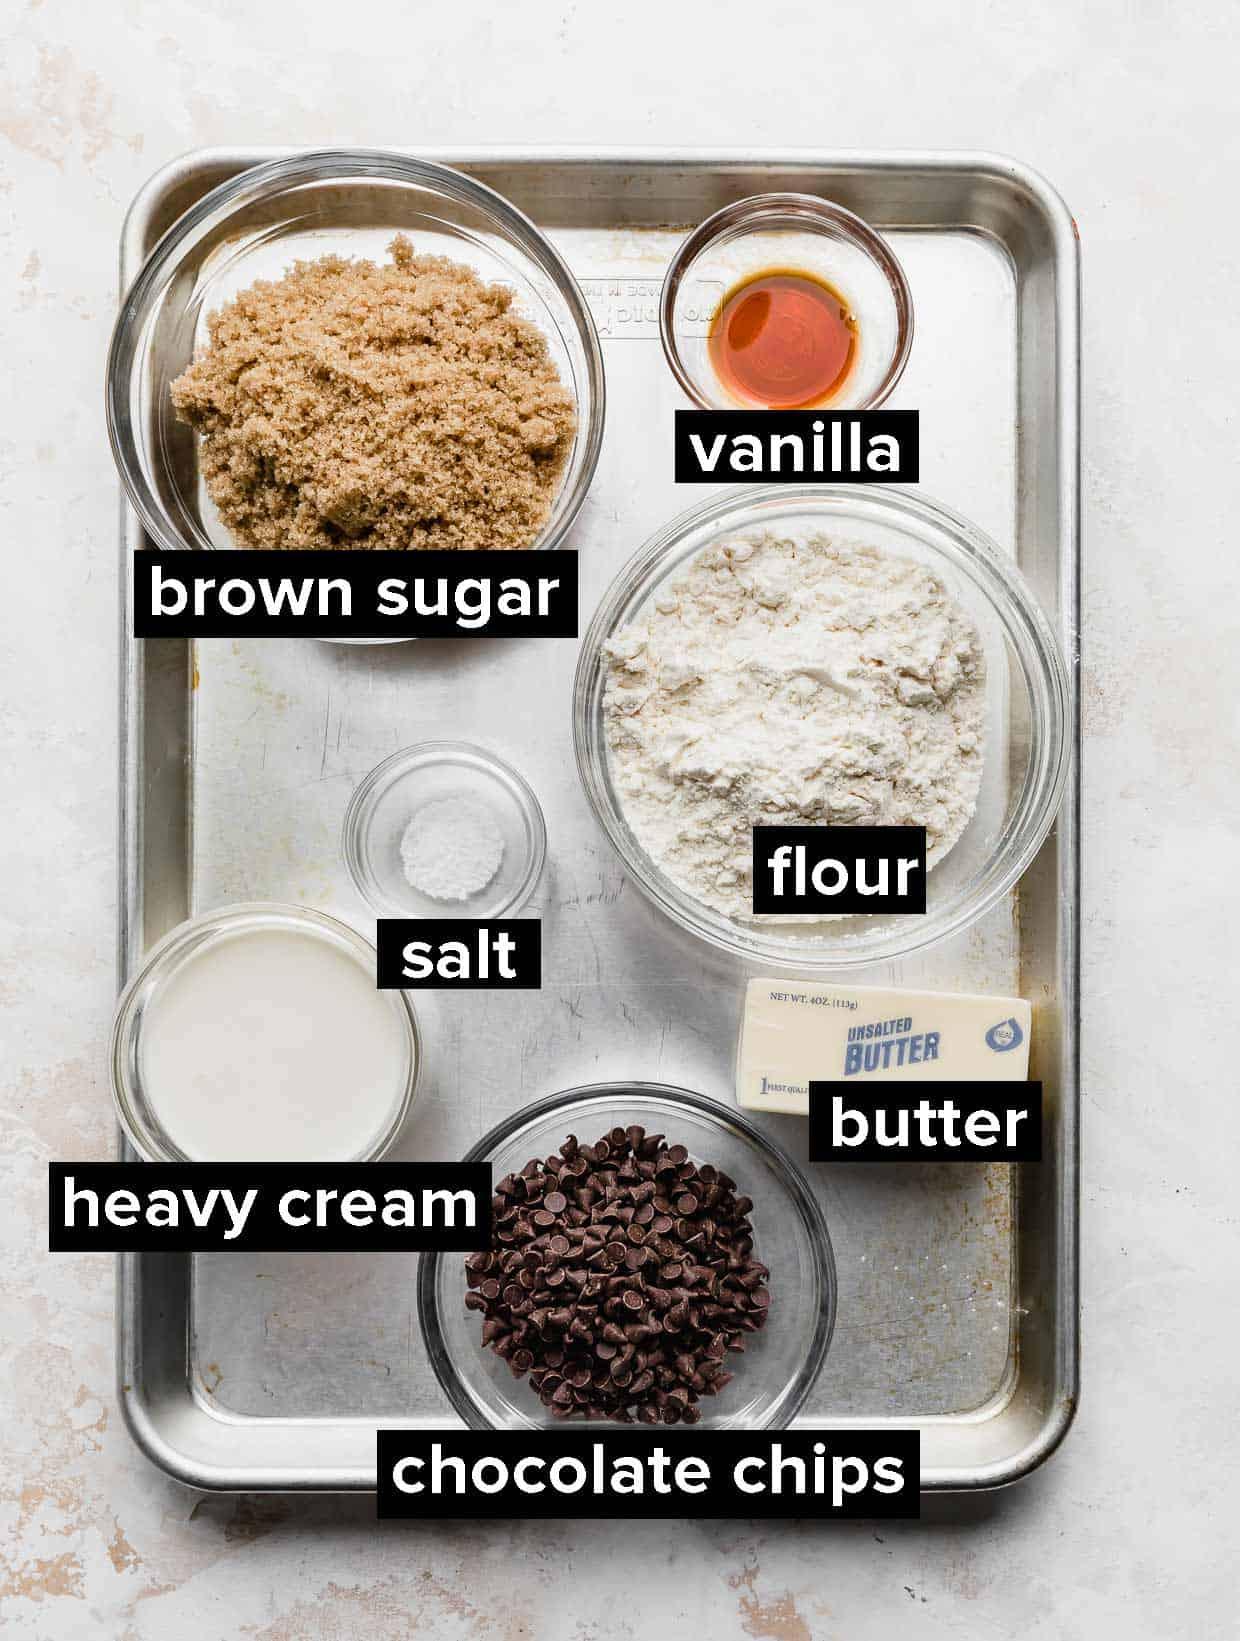 ingredients used to make edible cookie dough bites on a baking sheet.